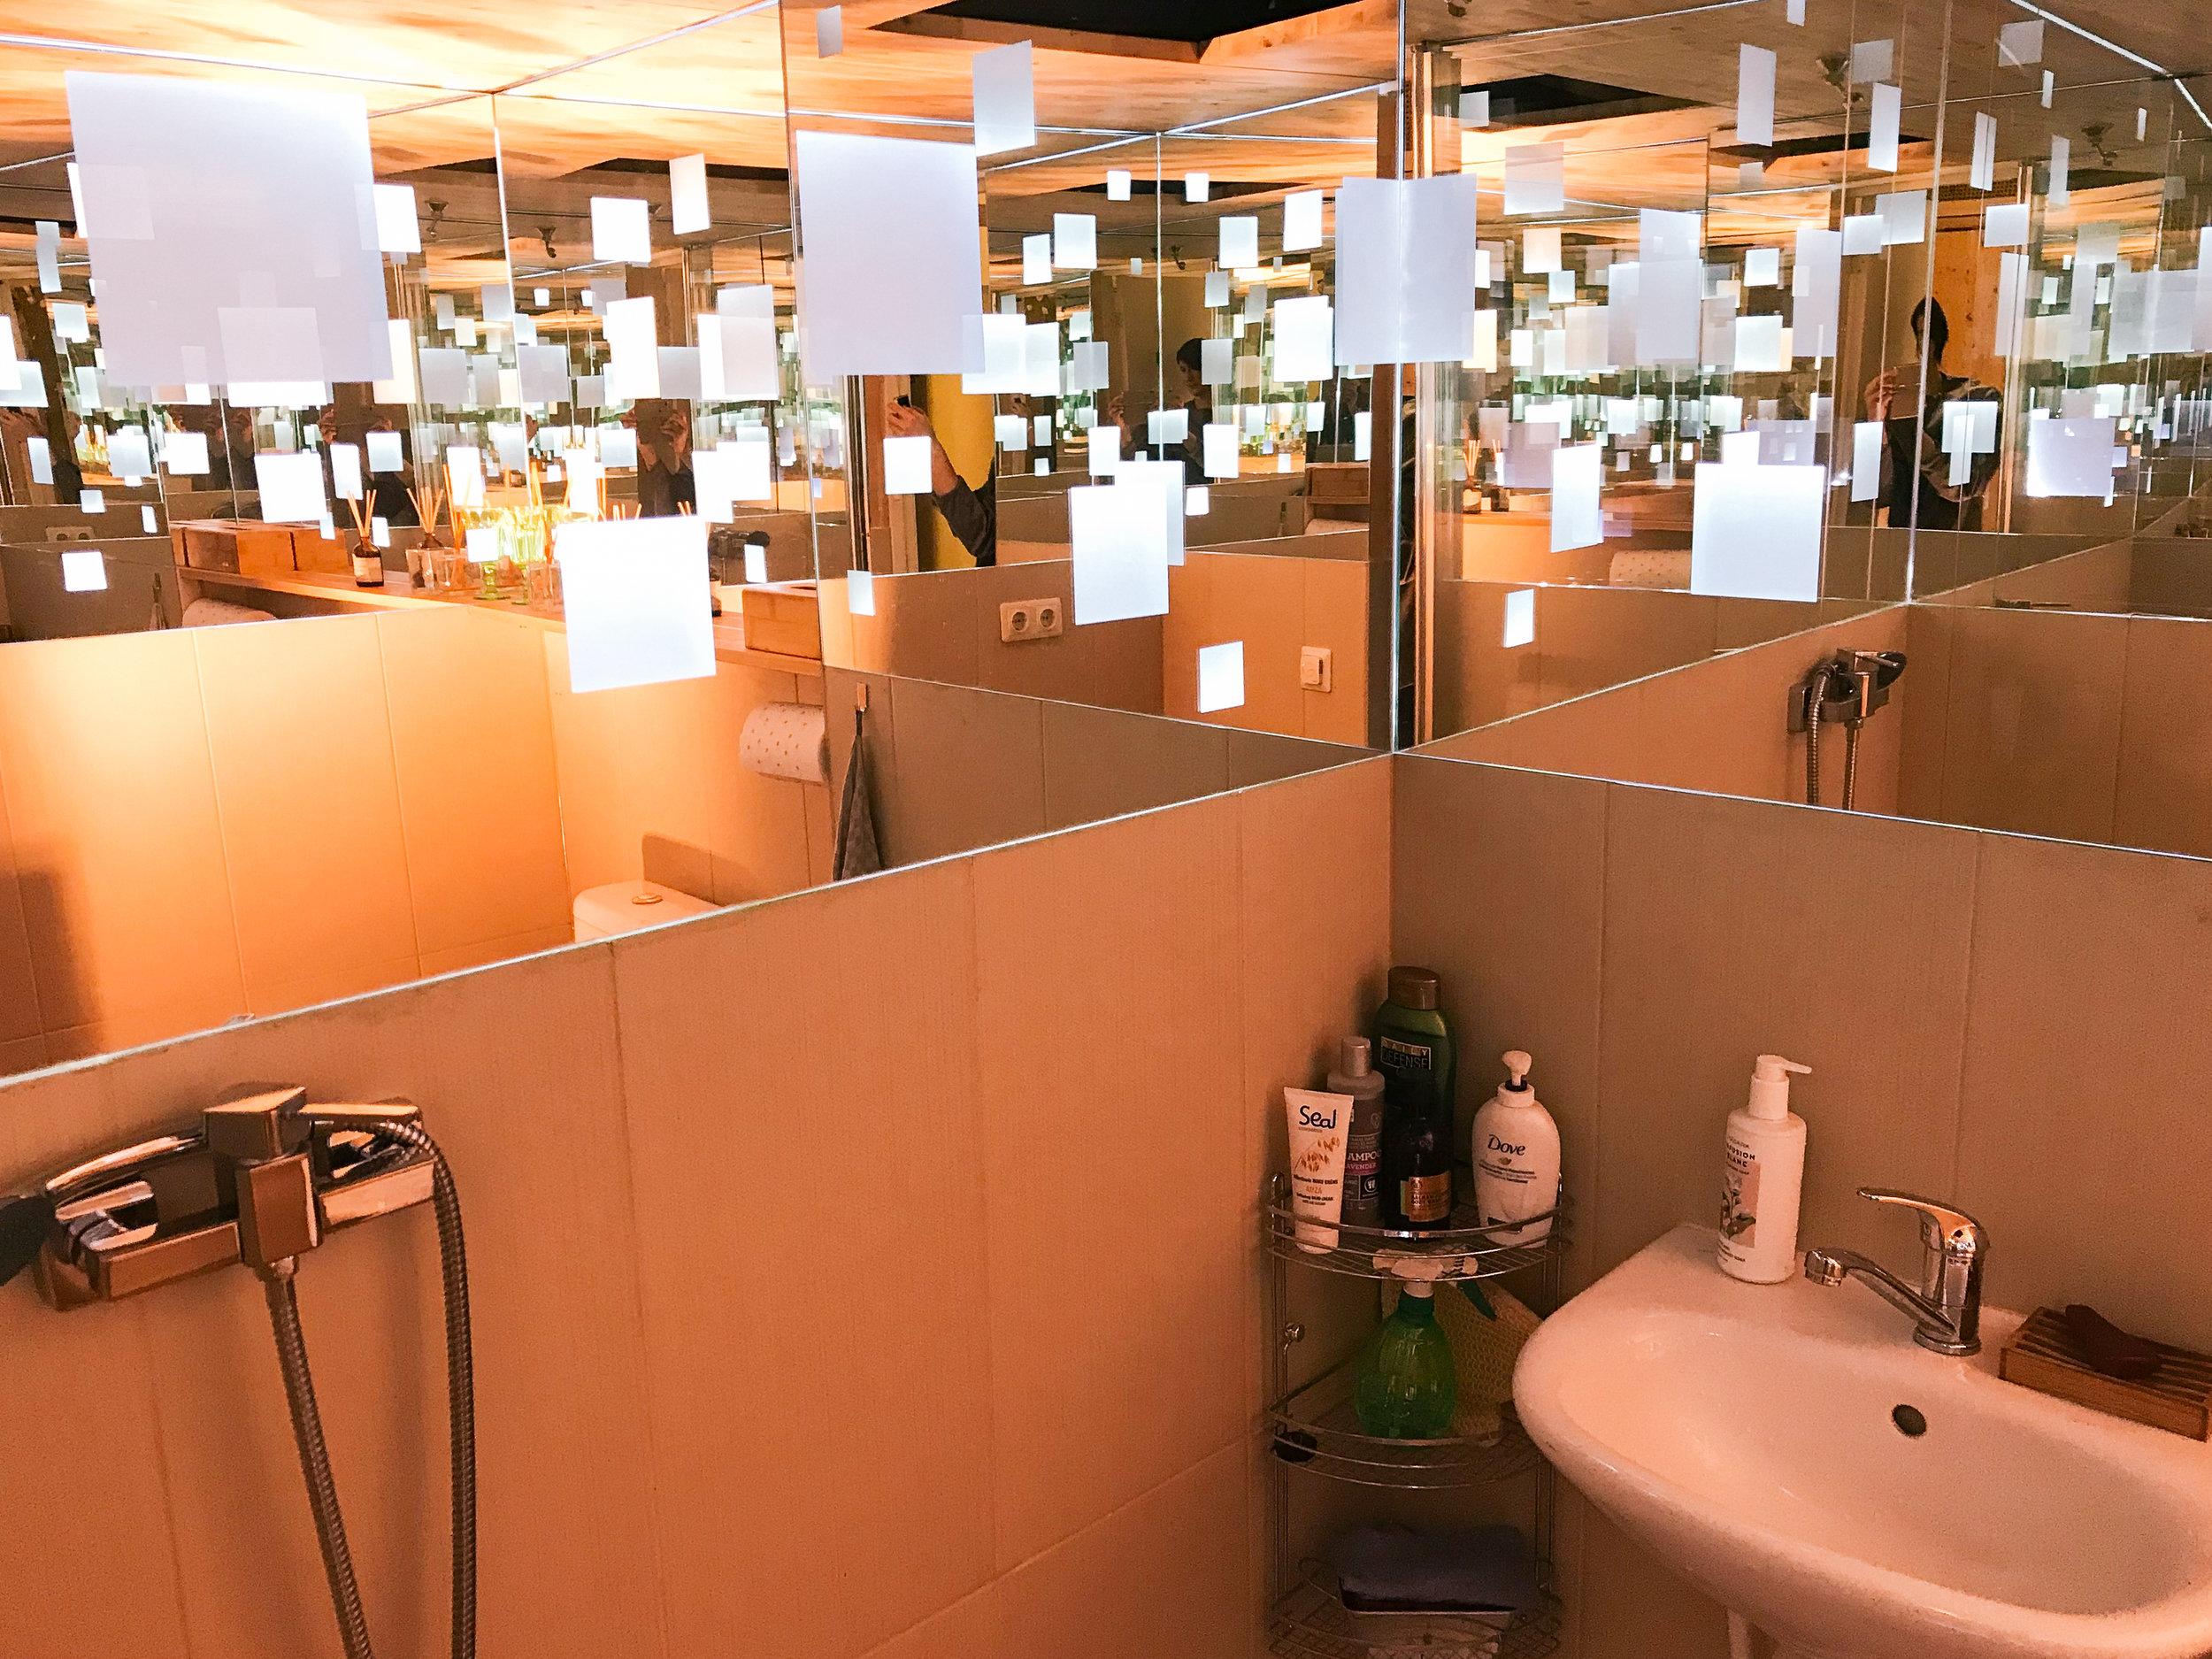 WC - shower room.jpg